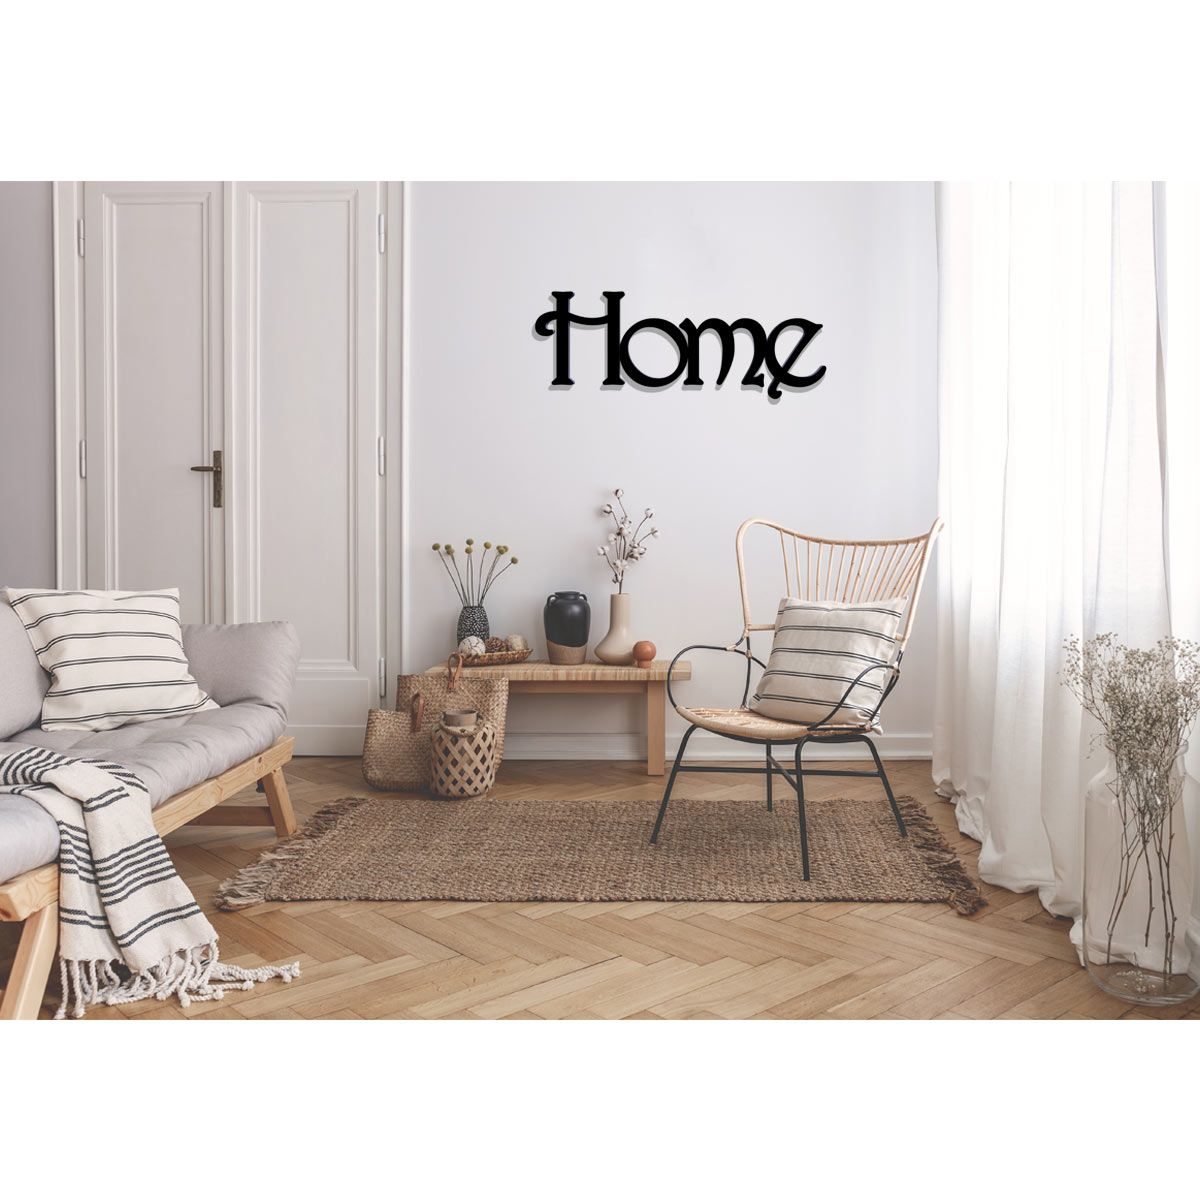 Harrington-Home-Front-Room